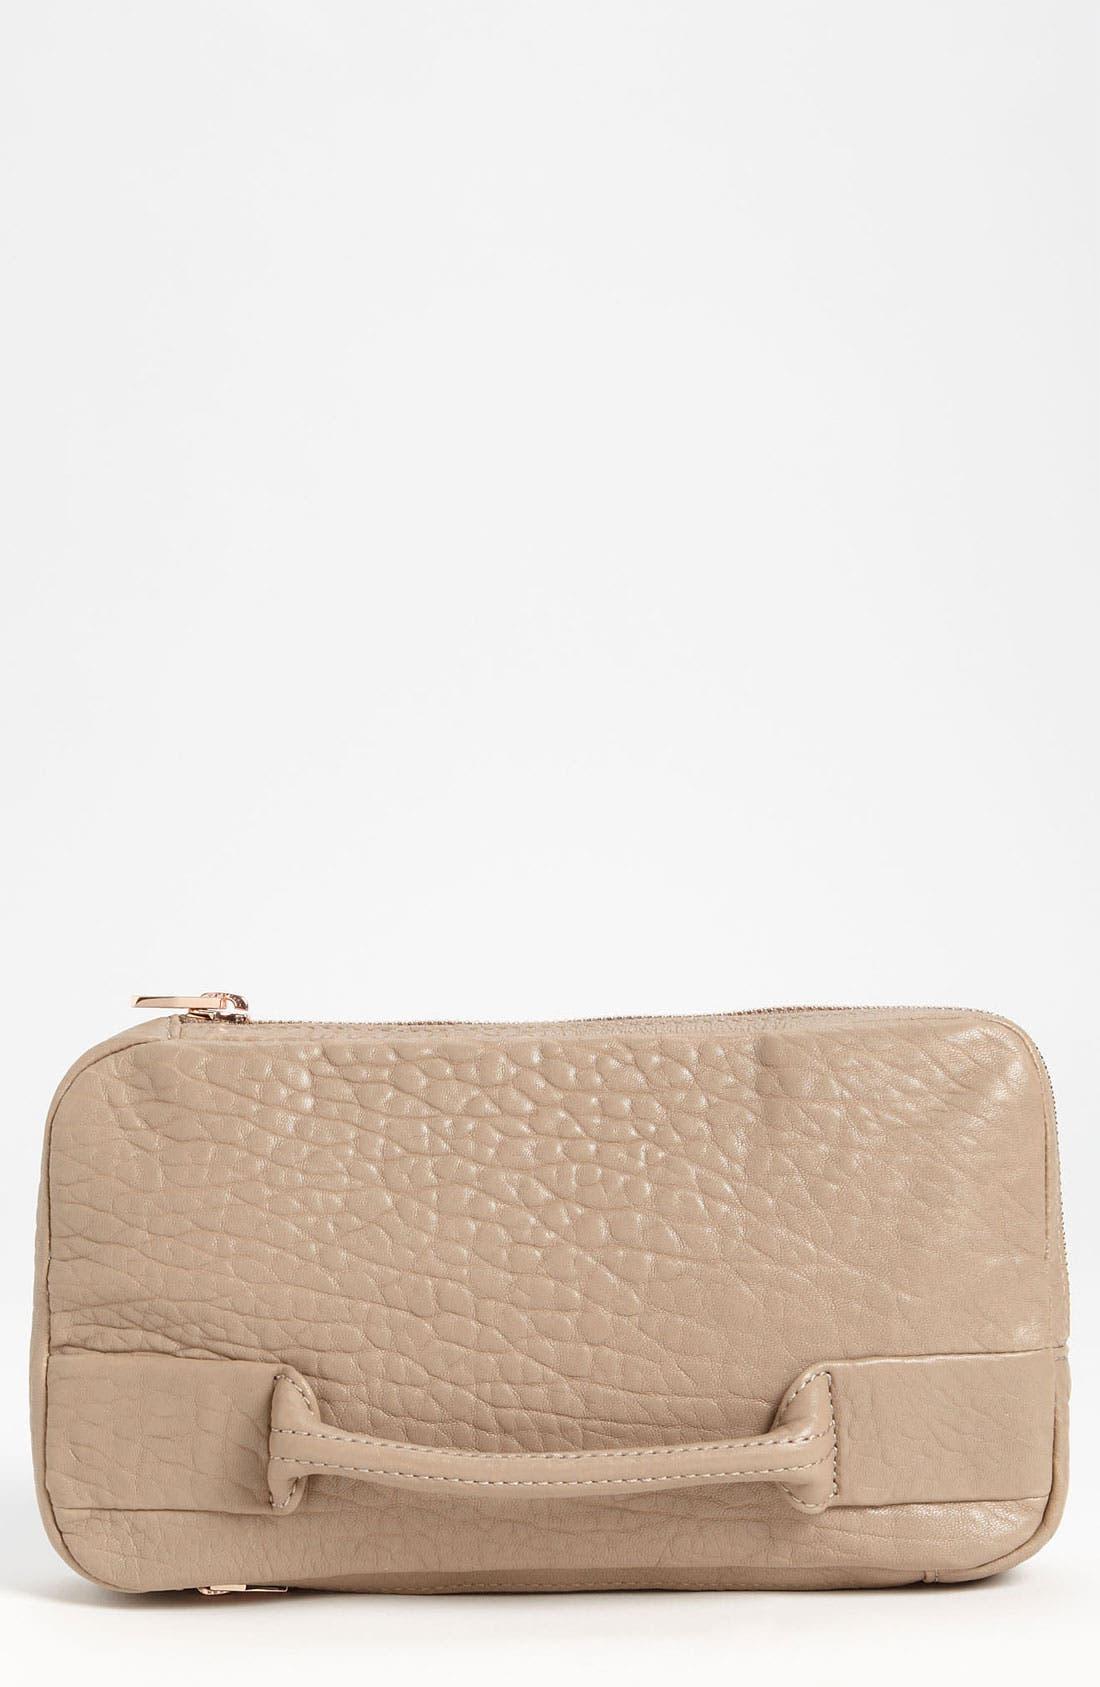 Main Image - Alexander Wang 'Dumbo' Leather Clutch